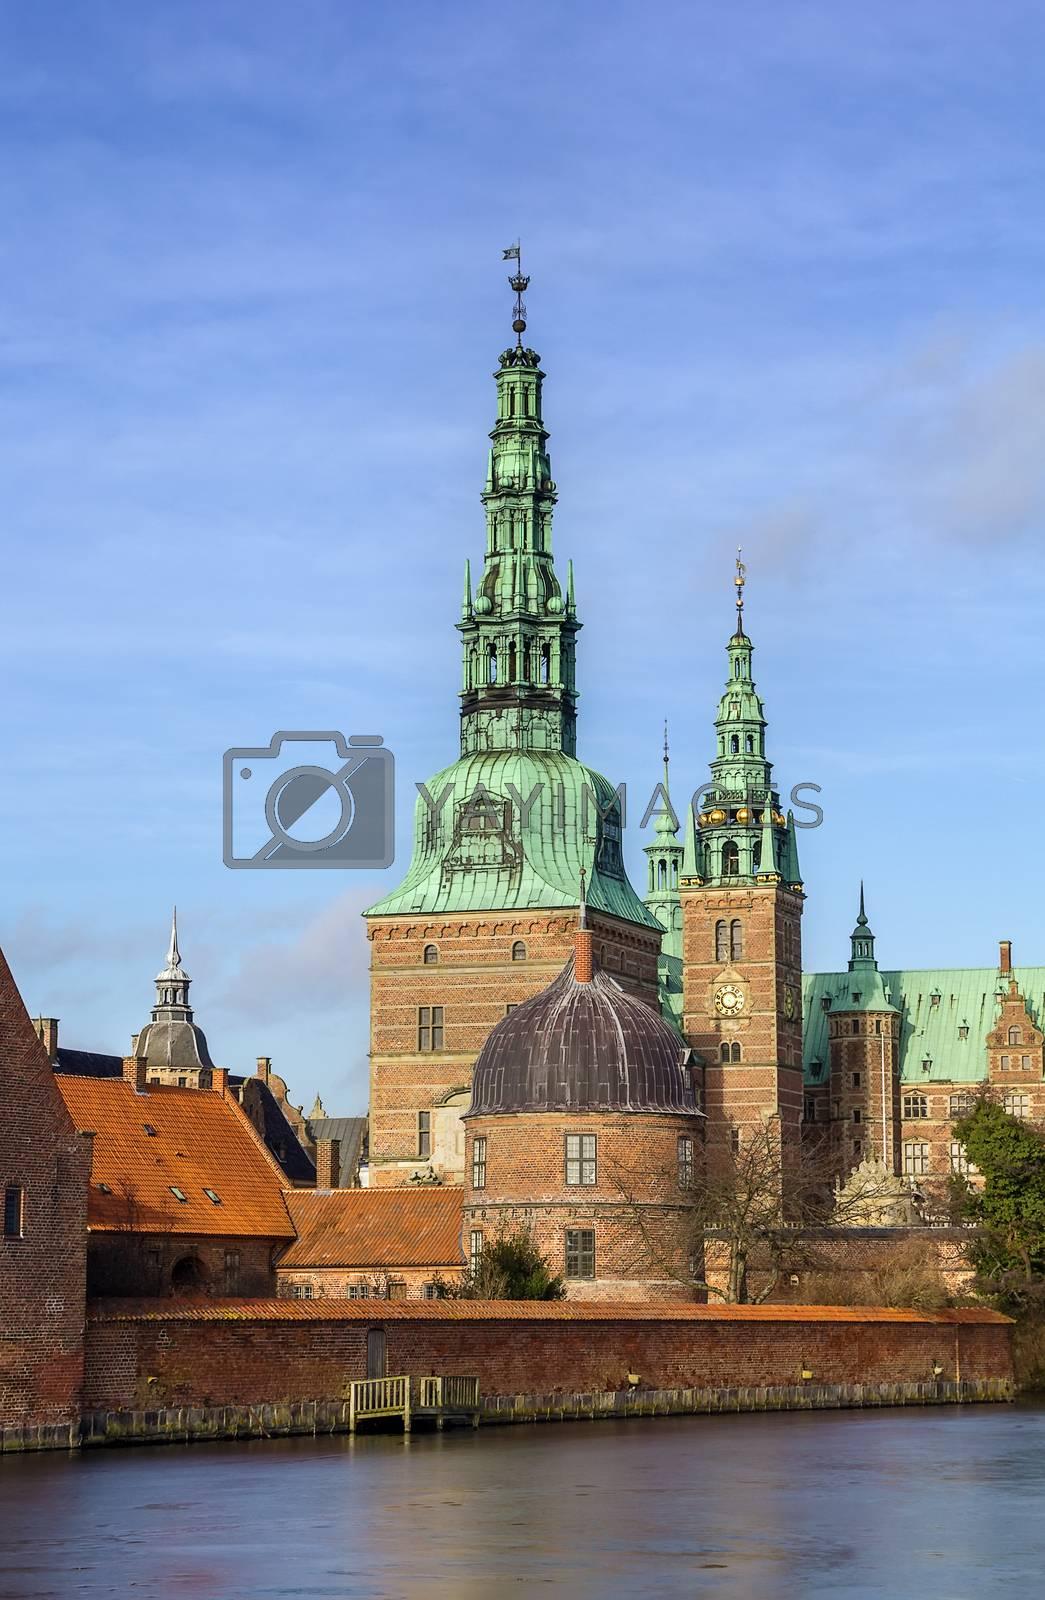 Frederiksborg, Denmark by borisb17